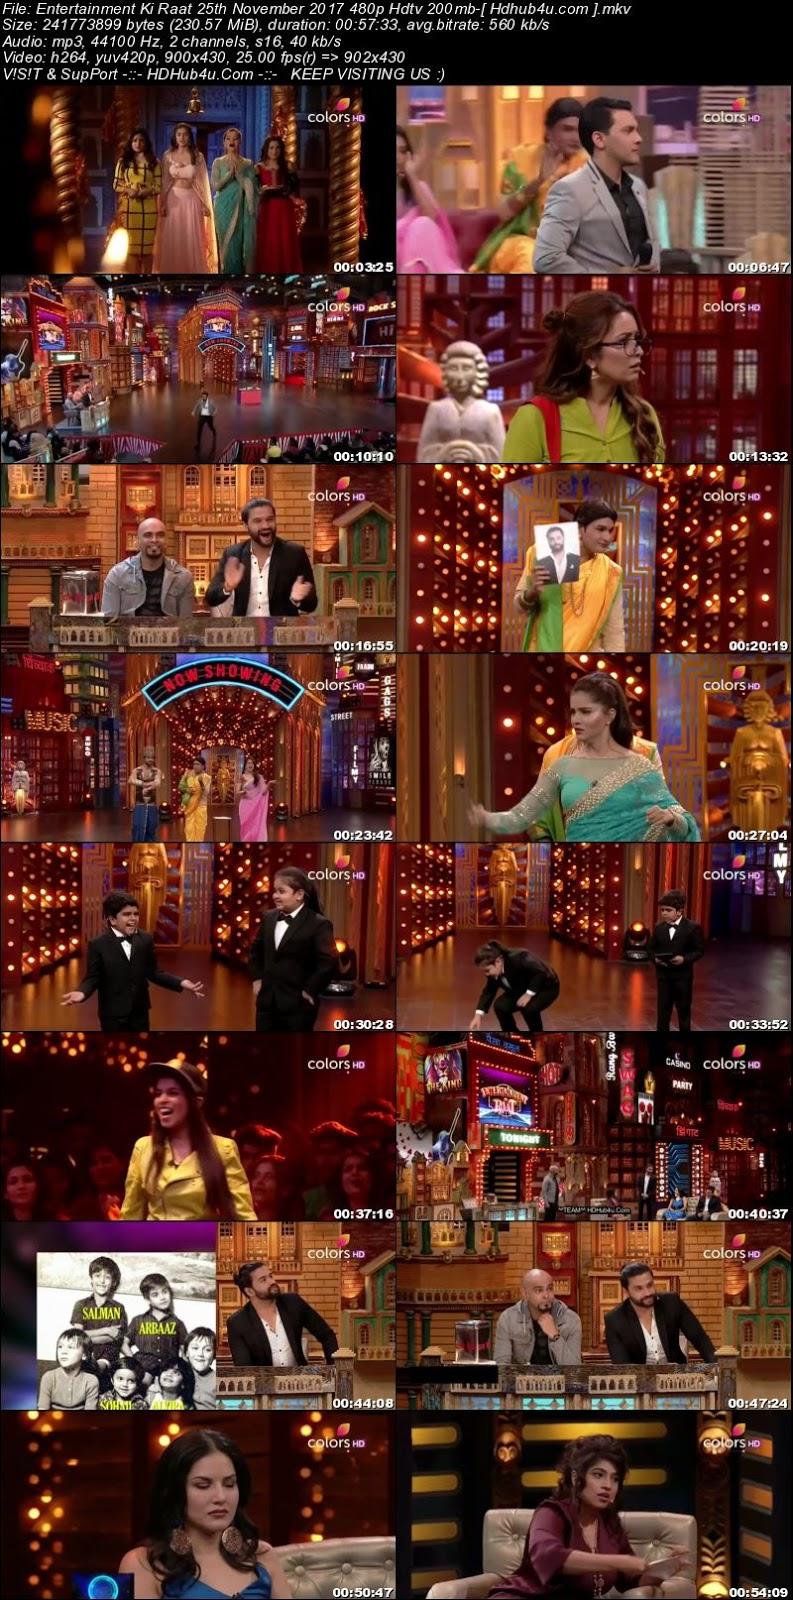 Entertainment Ki Raat 25th November 2017 480p HDTV 200MB Download